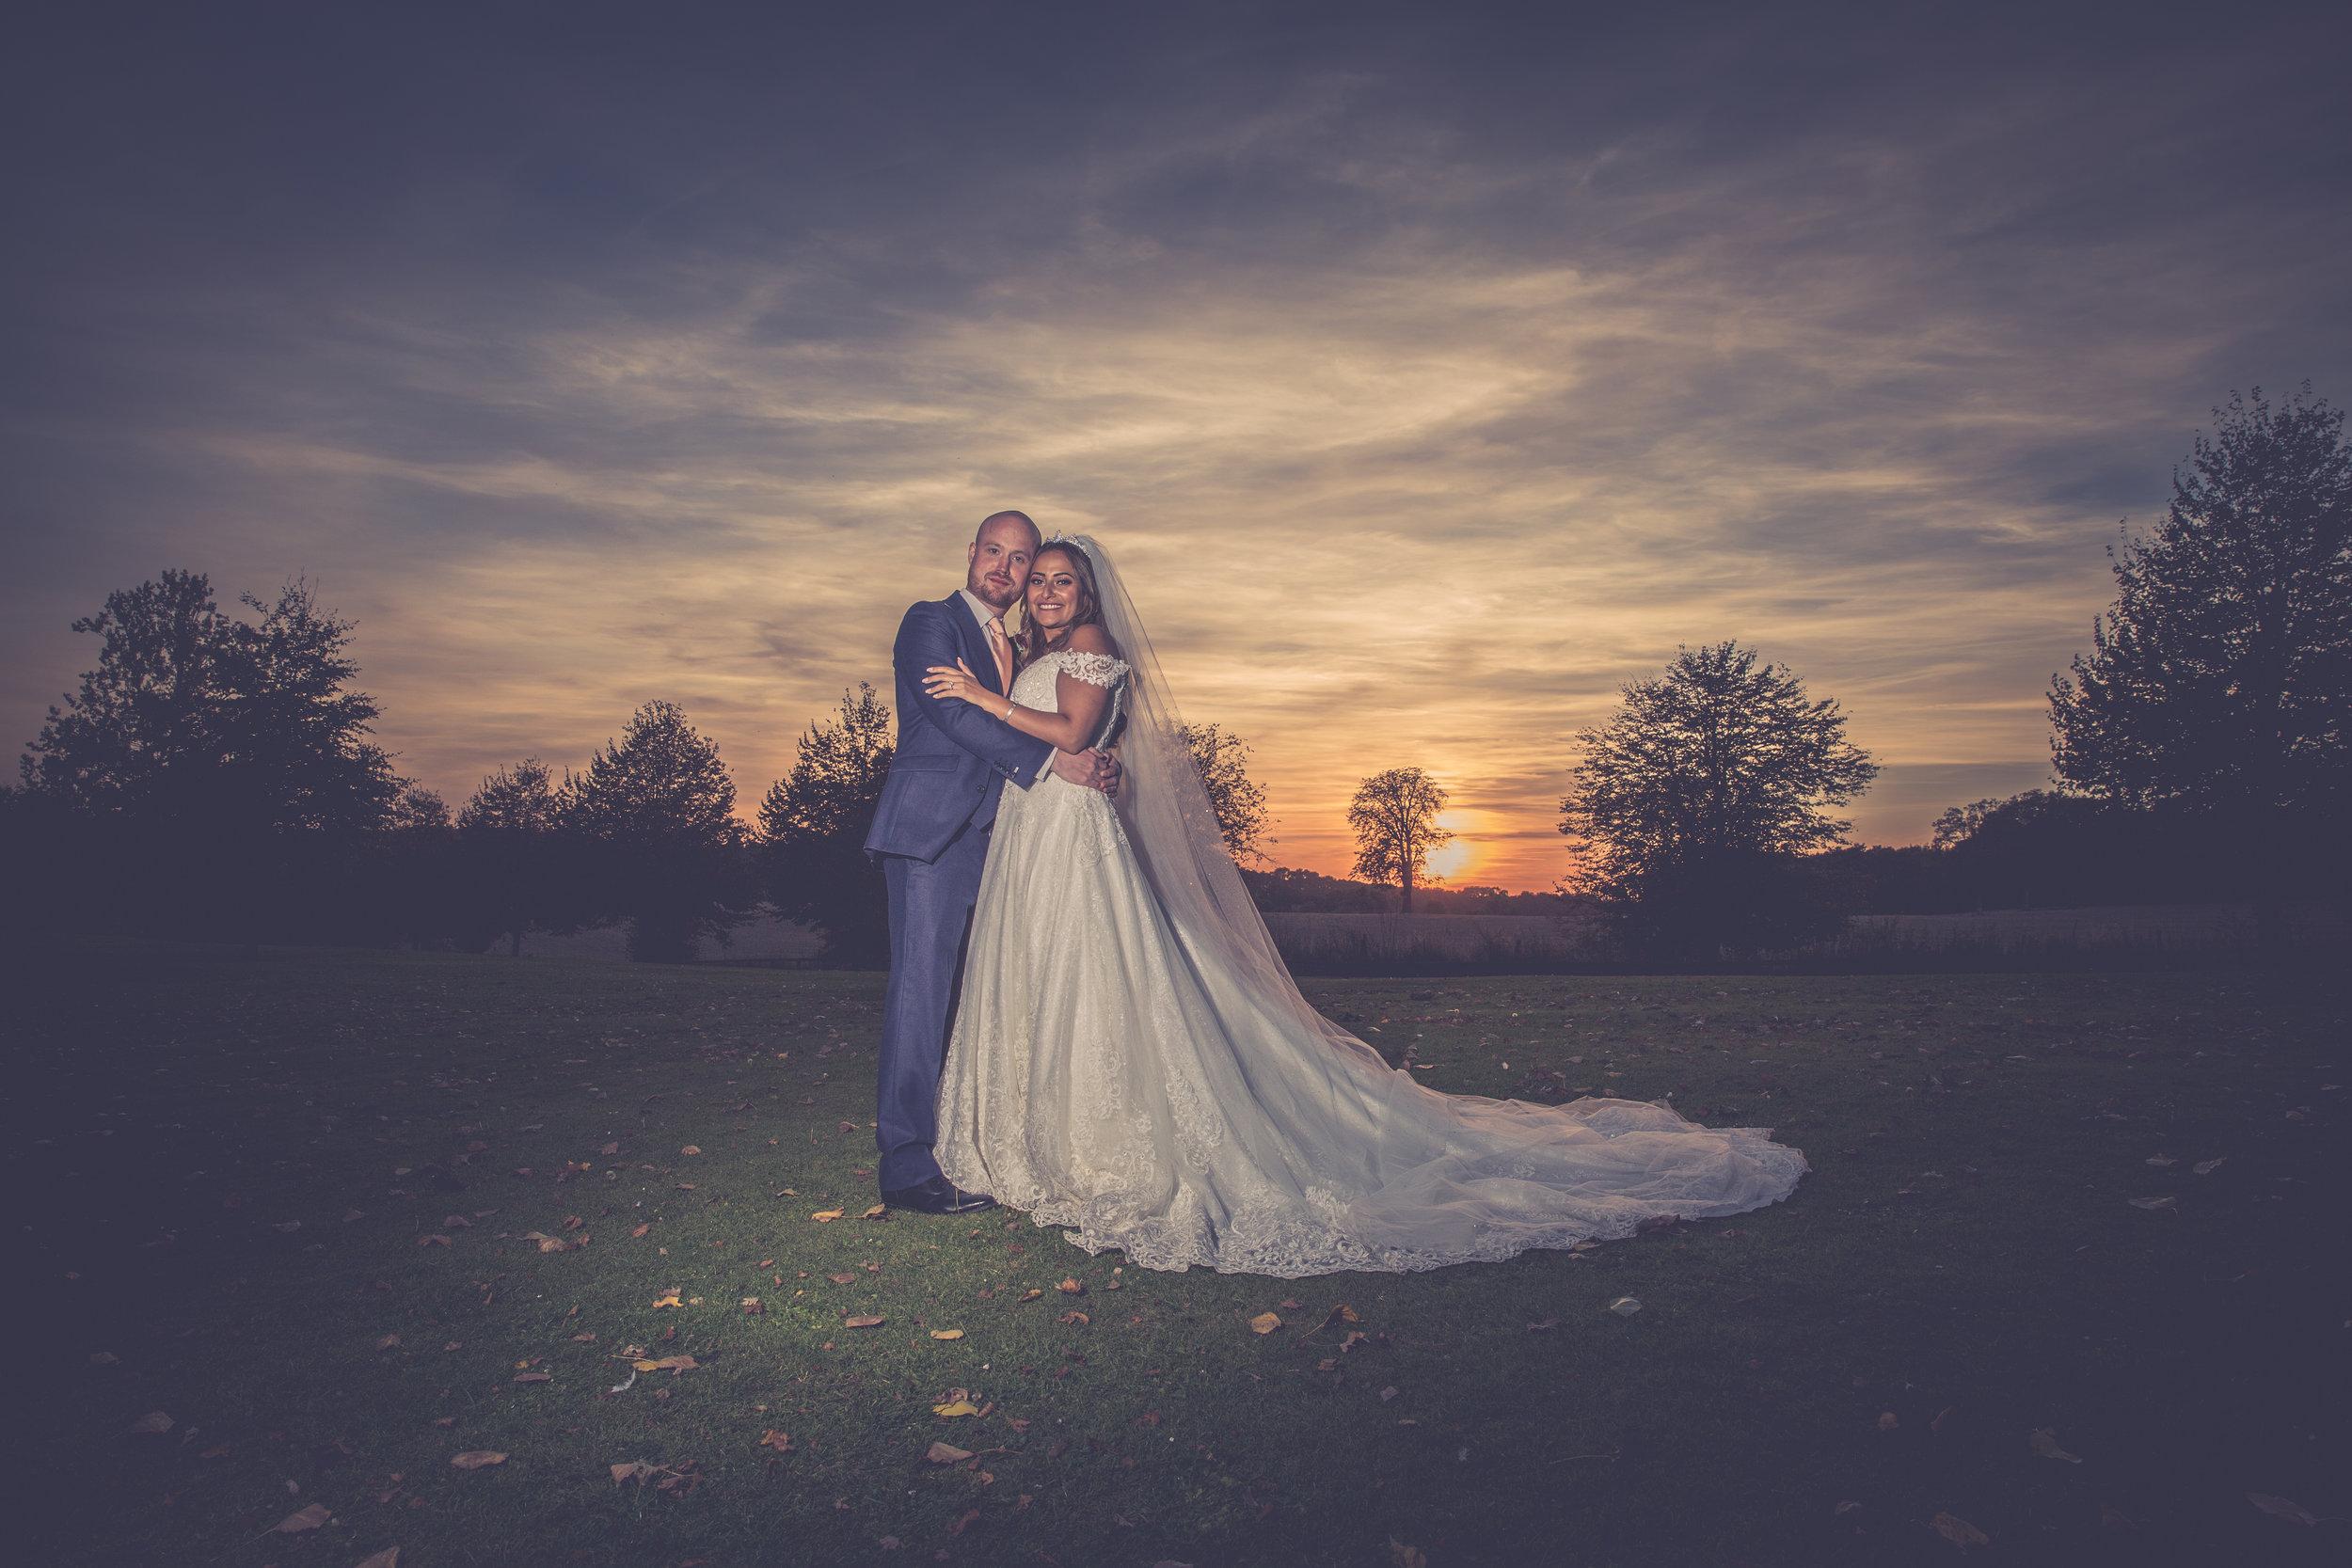 eastwell-manor-night-wedding.jpg